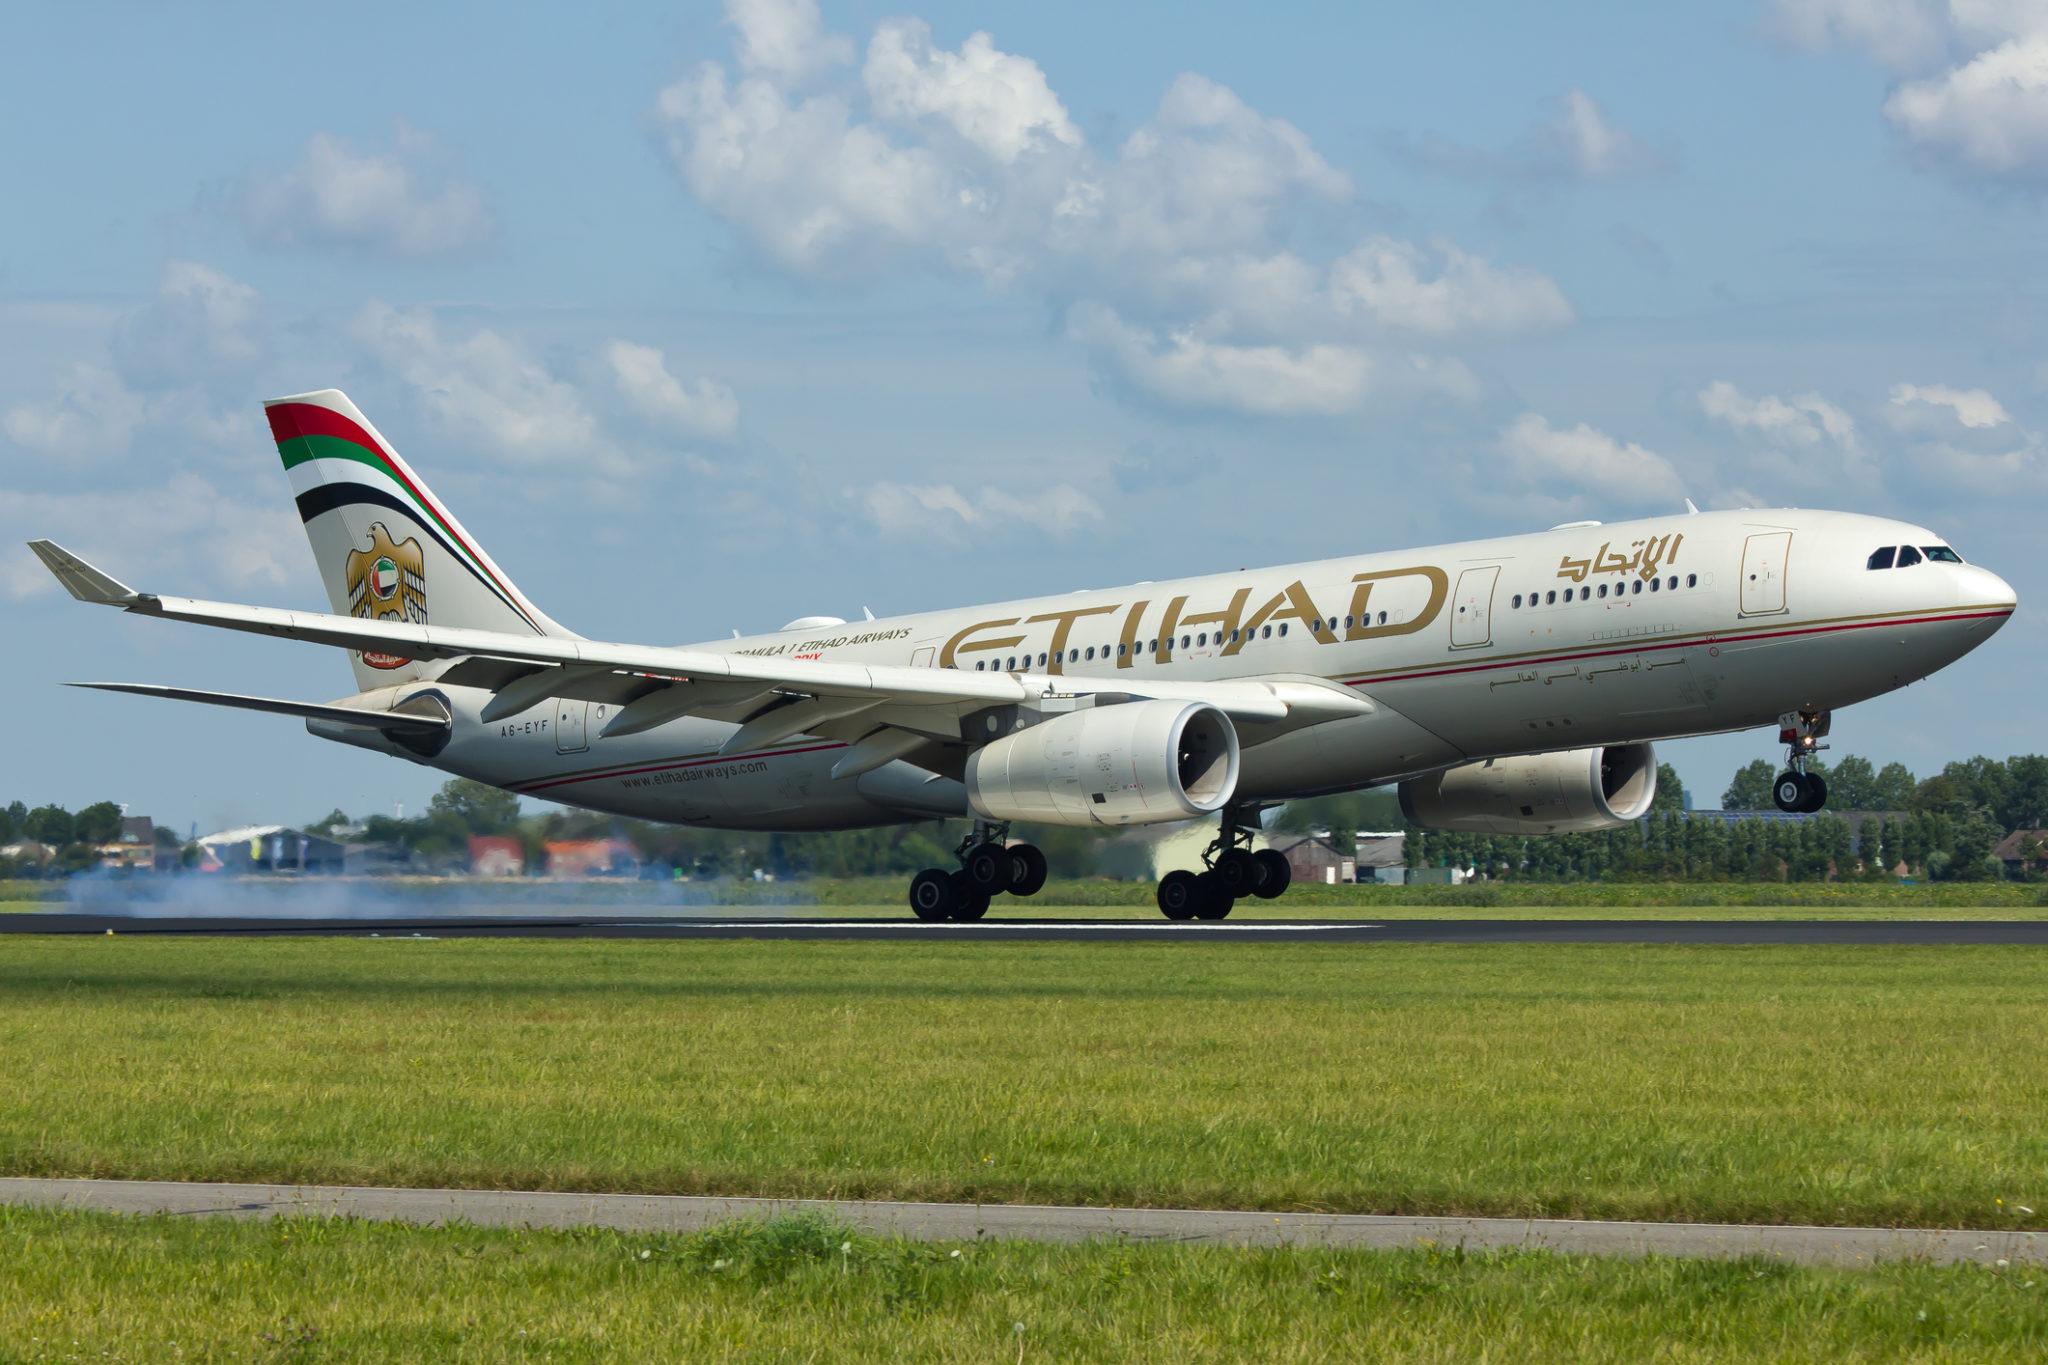 Letadlo Etihad Airways